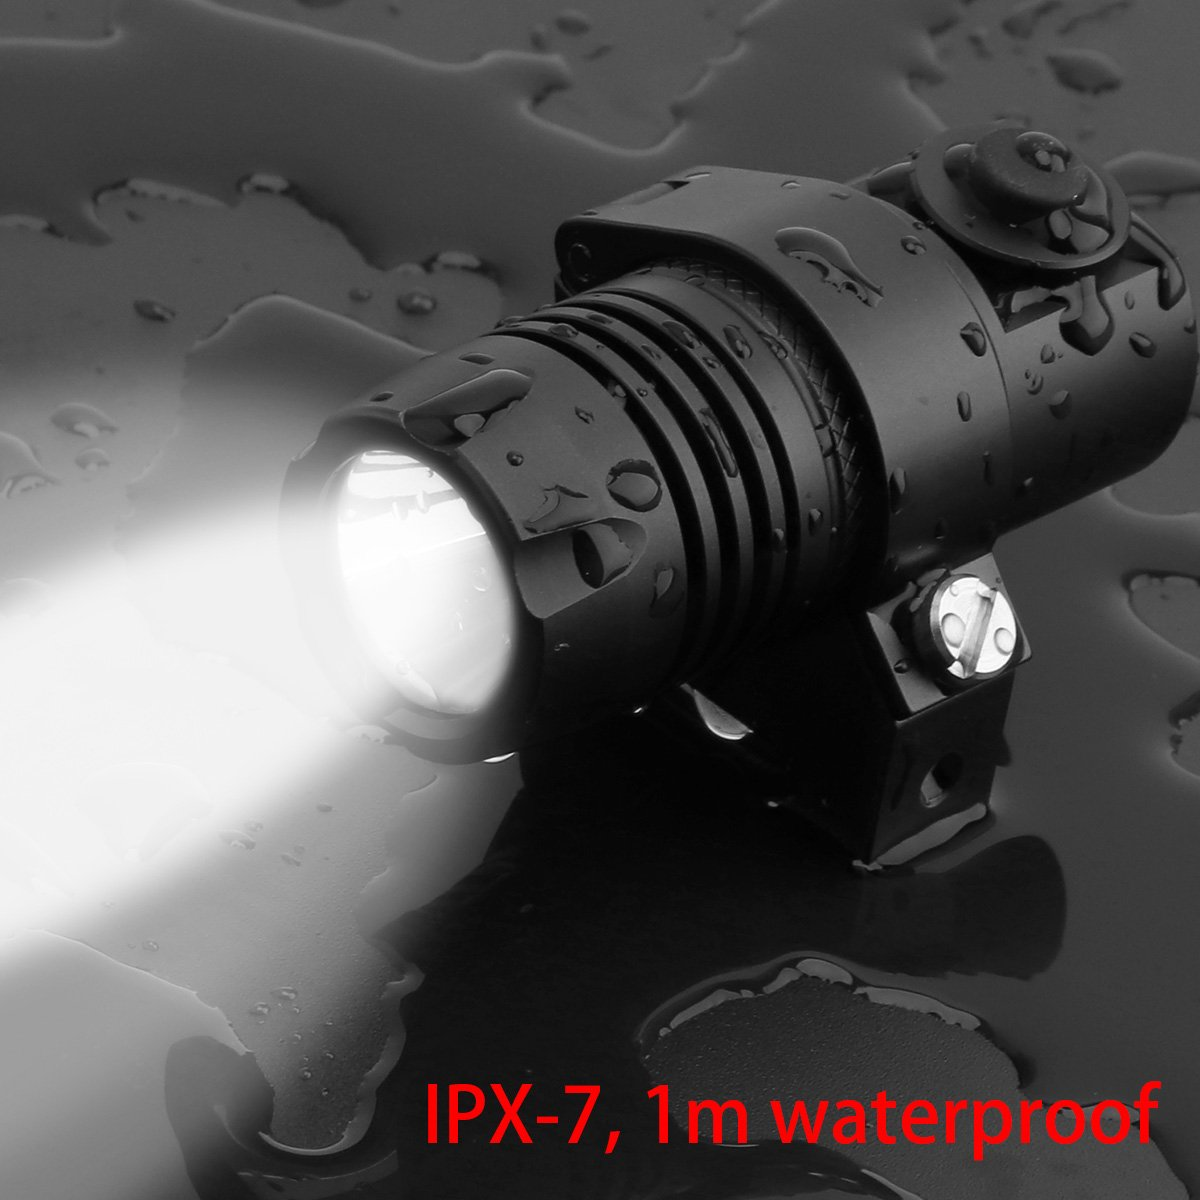 2-mode 210LM Handgun Pistol torcia con luce Weaver Mount SecurityIng impermeabile CREE LED torcia gun-mounted Strobe